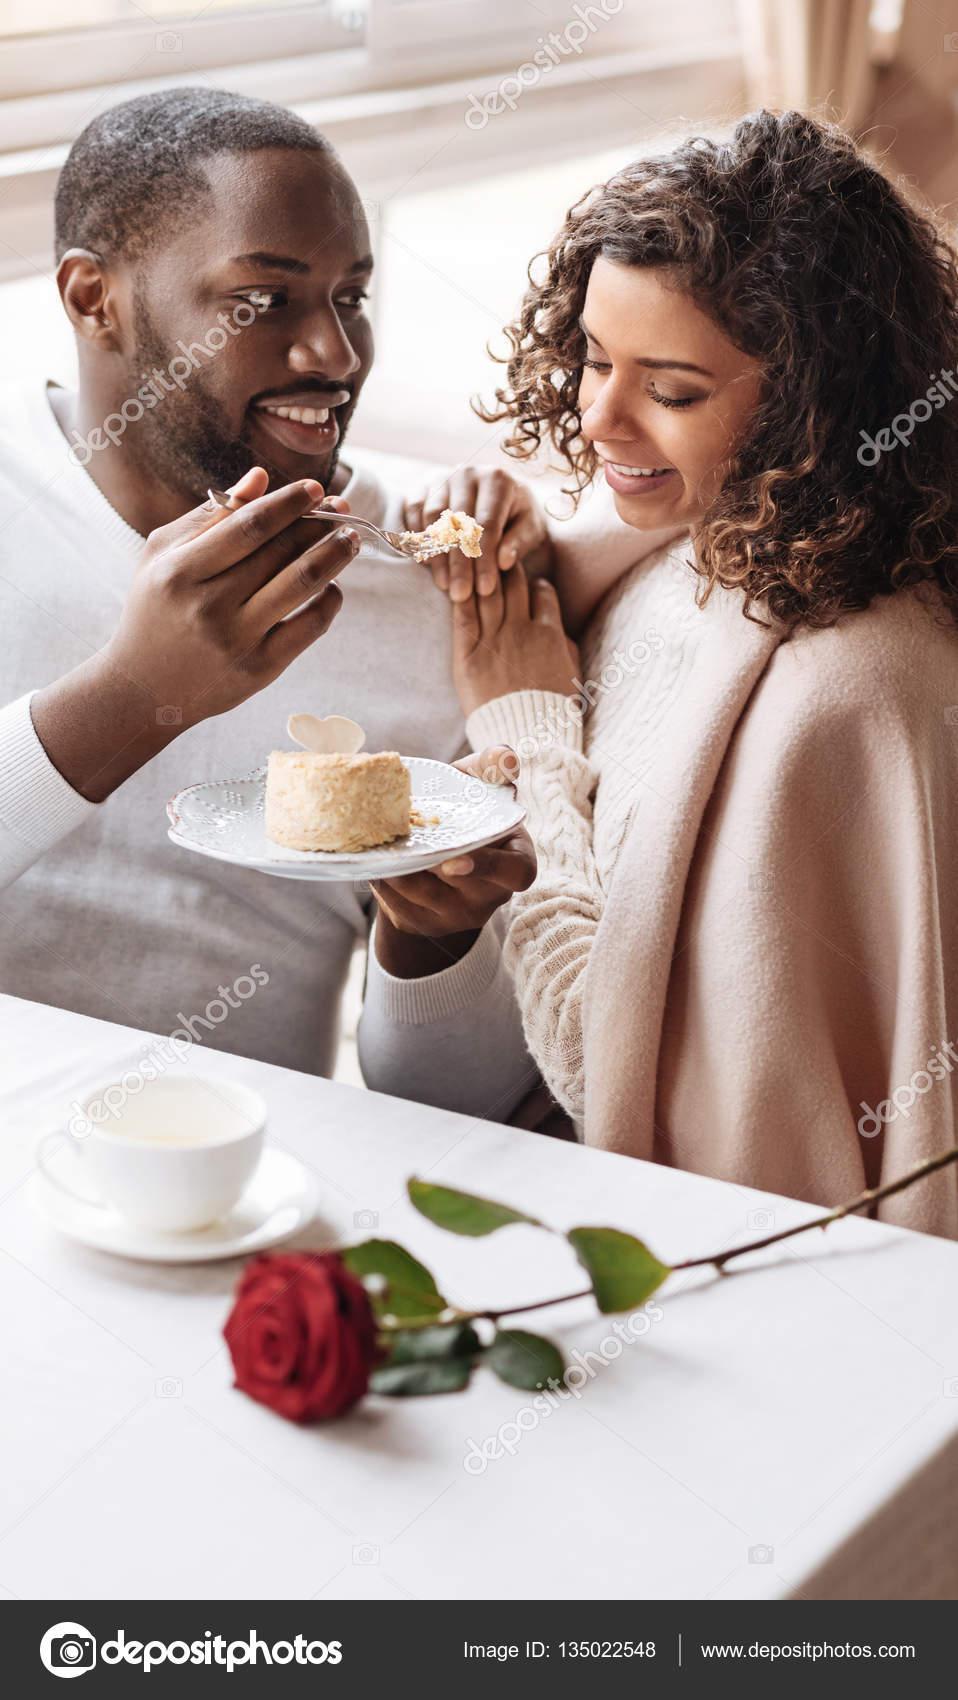 American Find Ashleymadison Dating African Tipi